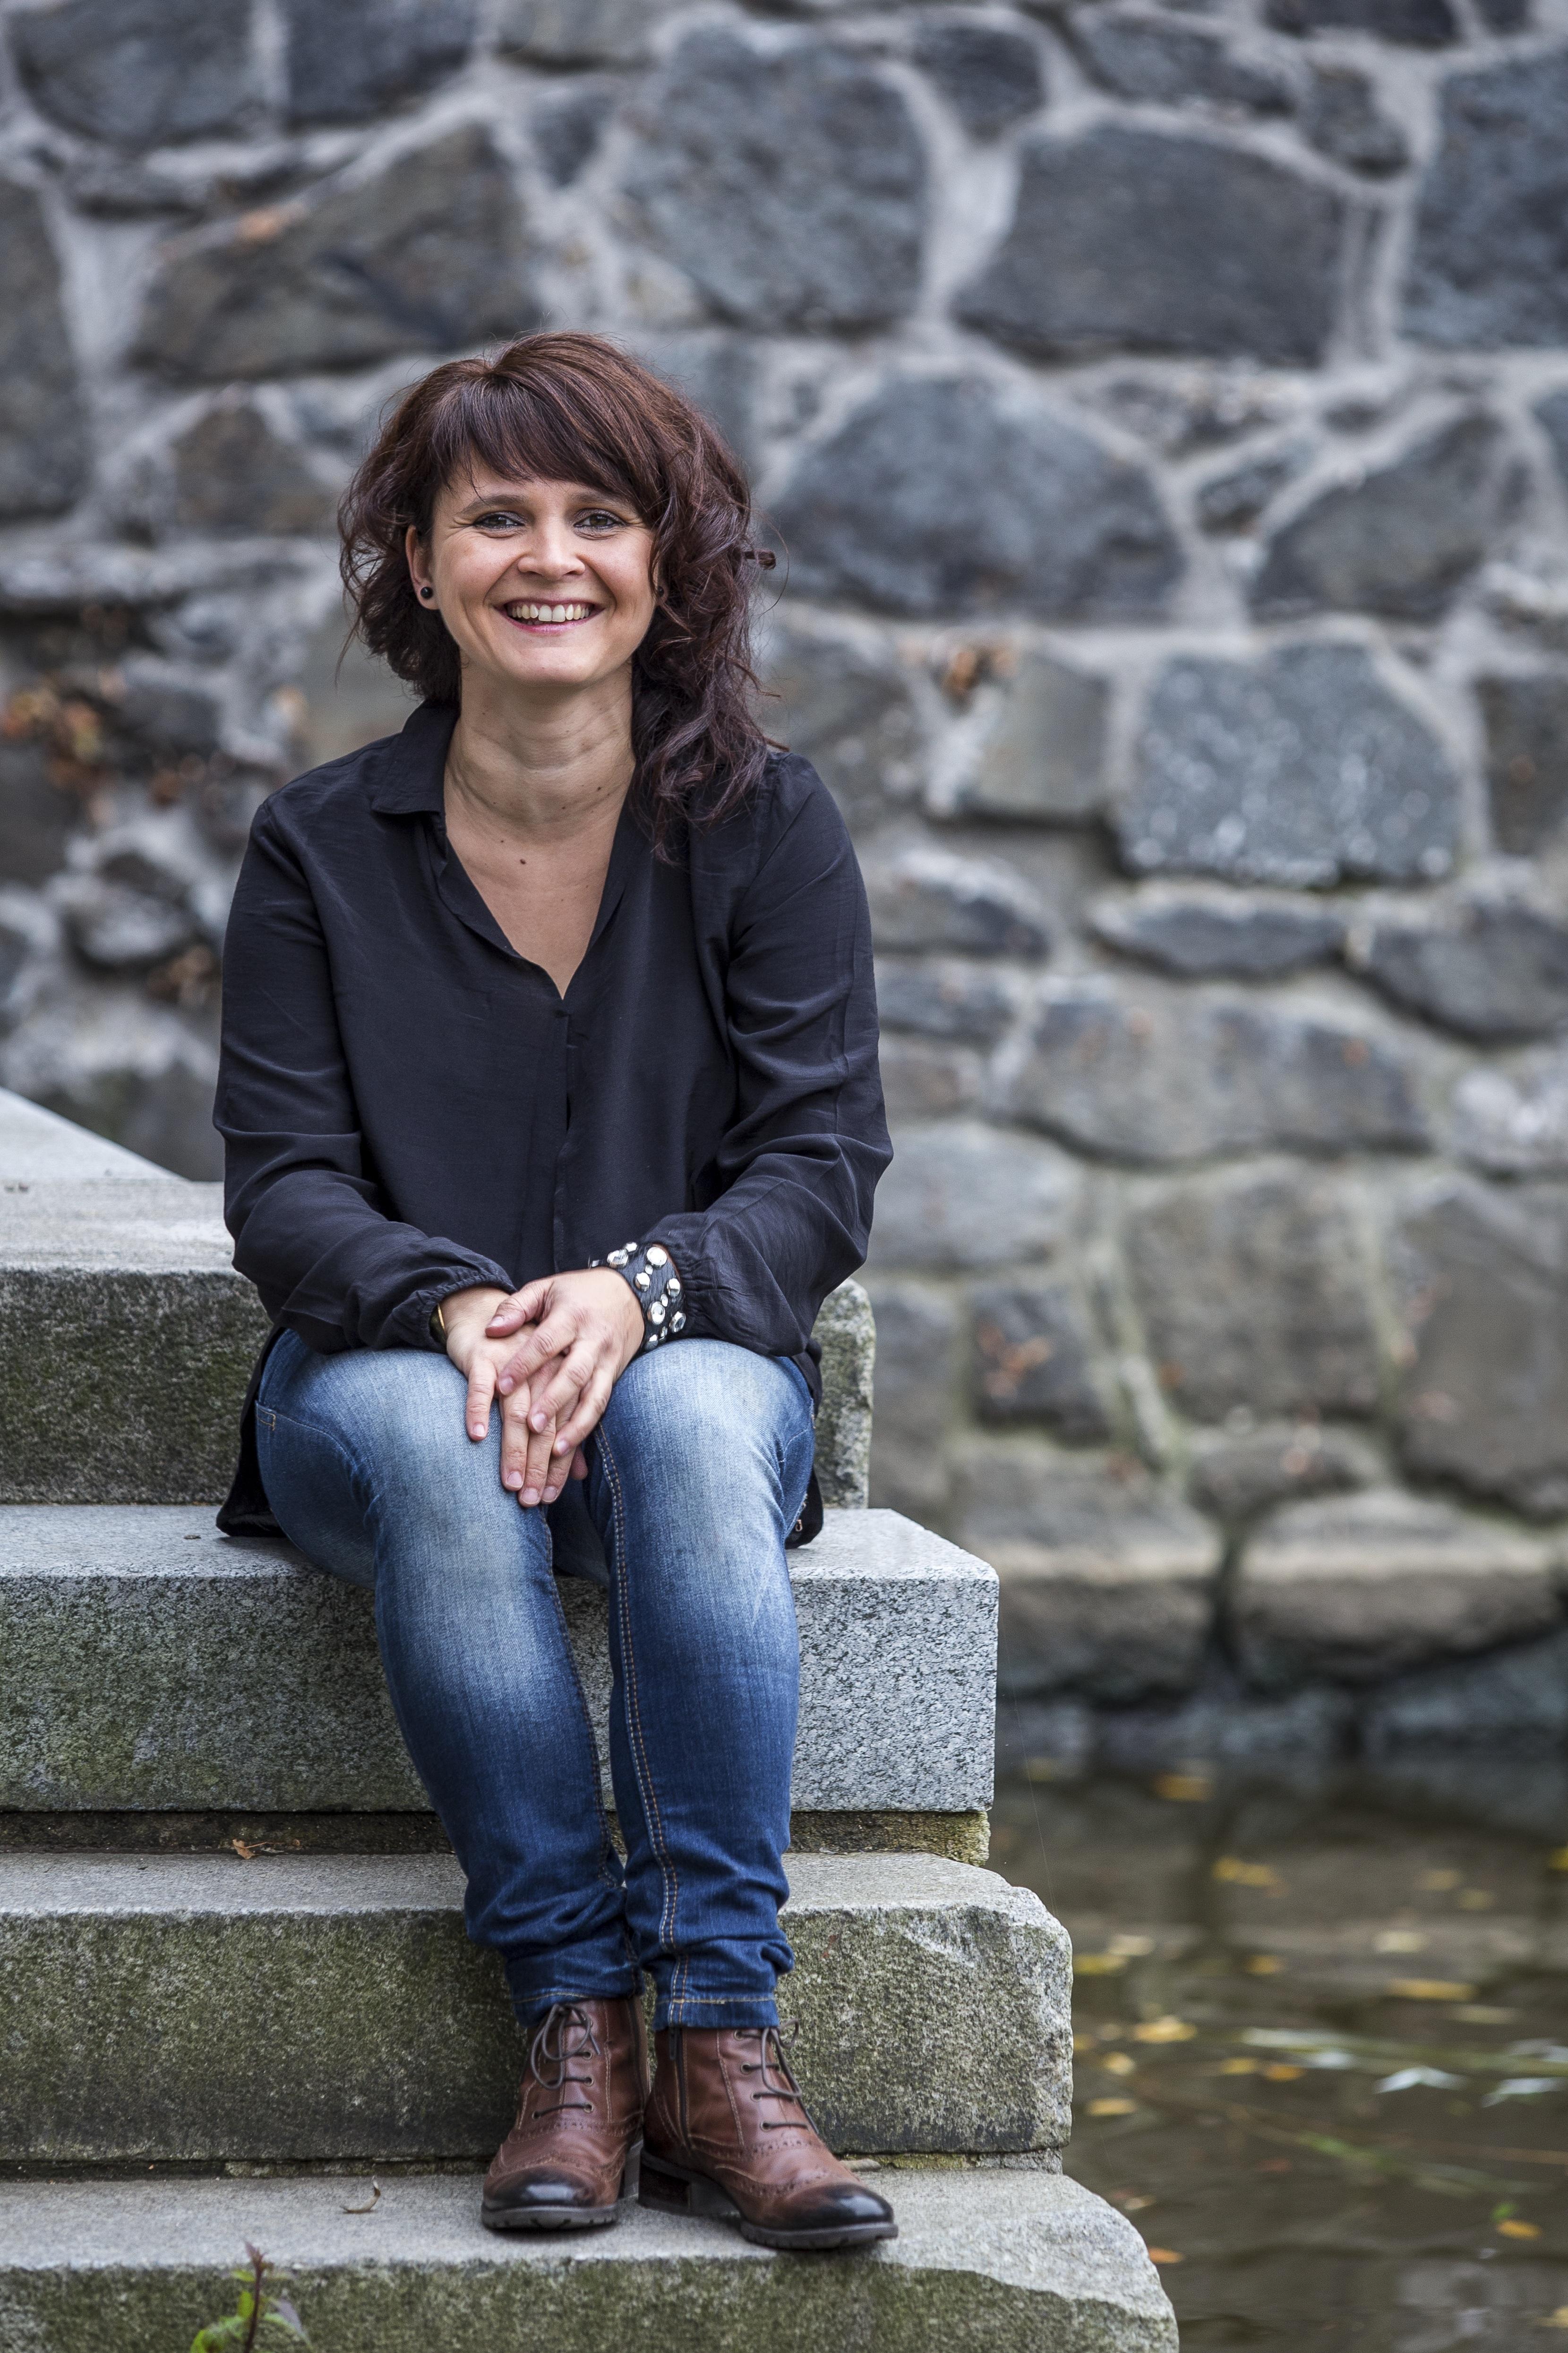 Beata Hlavenková odhaluje čas – recenze – Milan Bátor pro Ostravan.cz